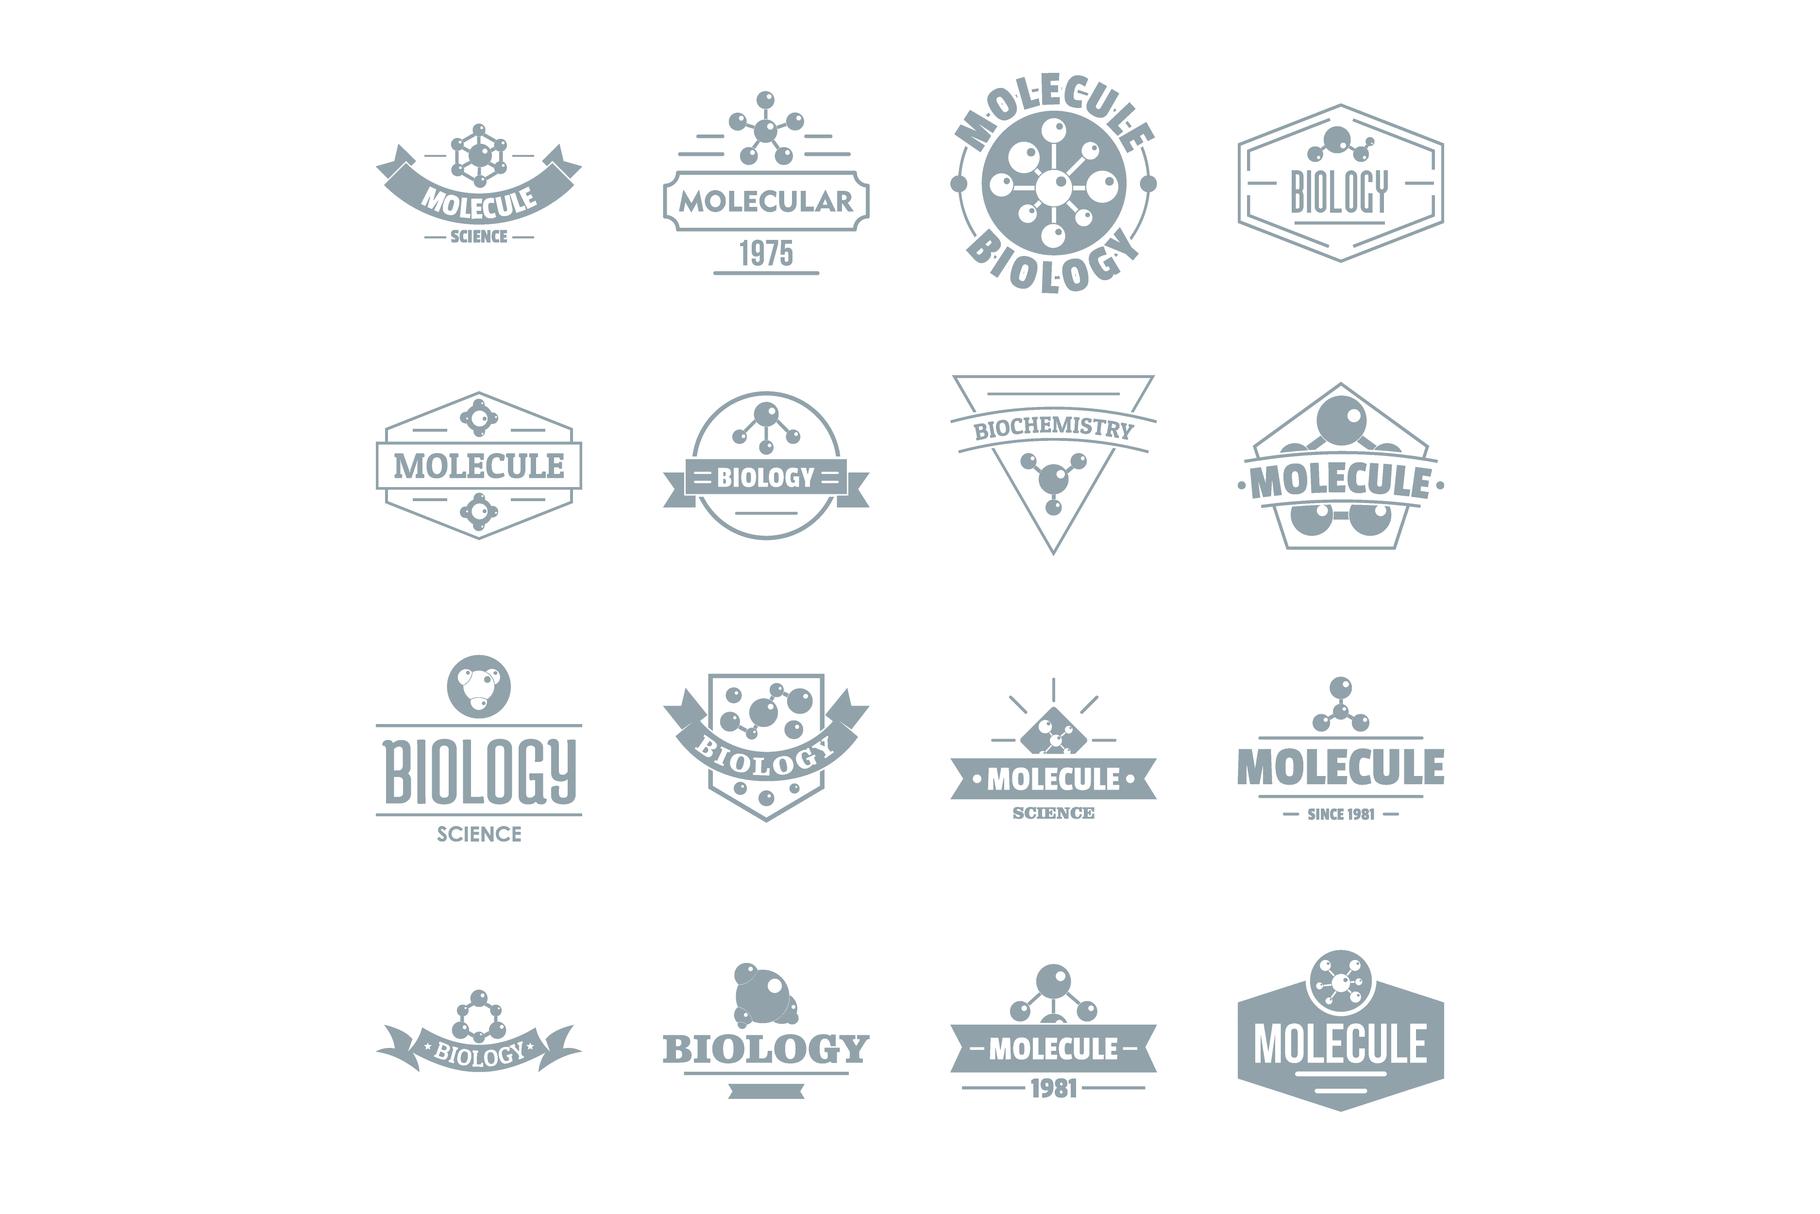 Molecule logo icons set, simple style example image 1